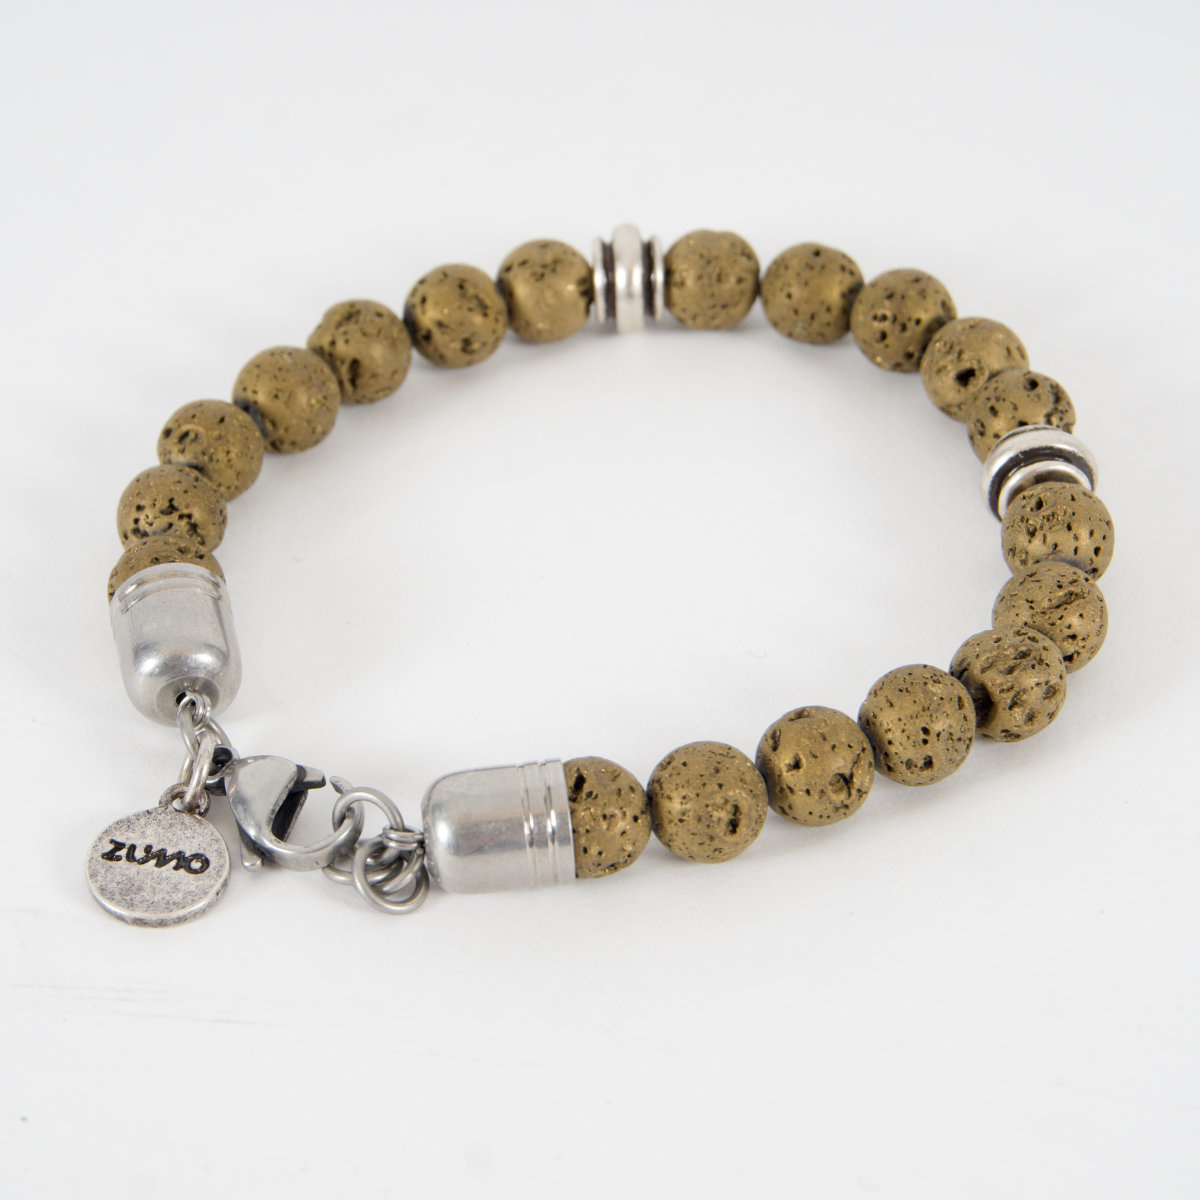 Zumo Bracelets SATOSHI-SB39966 Green